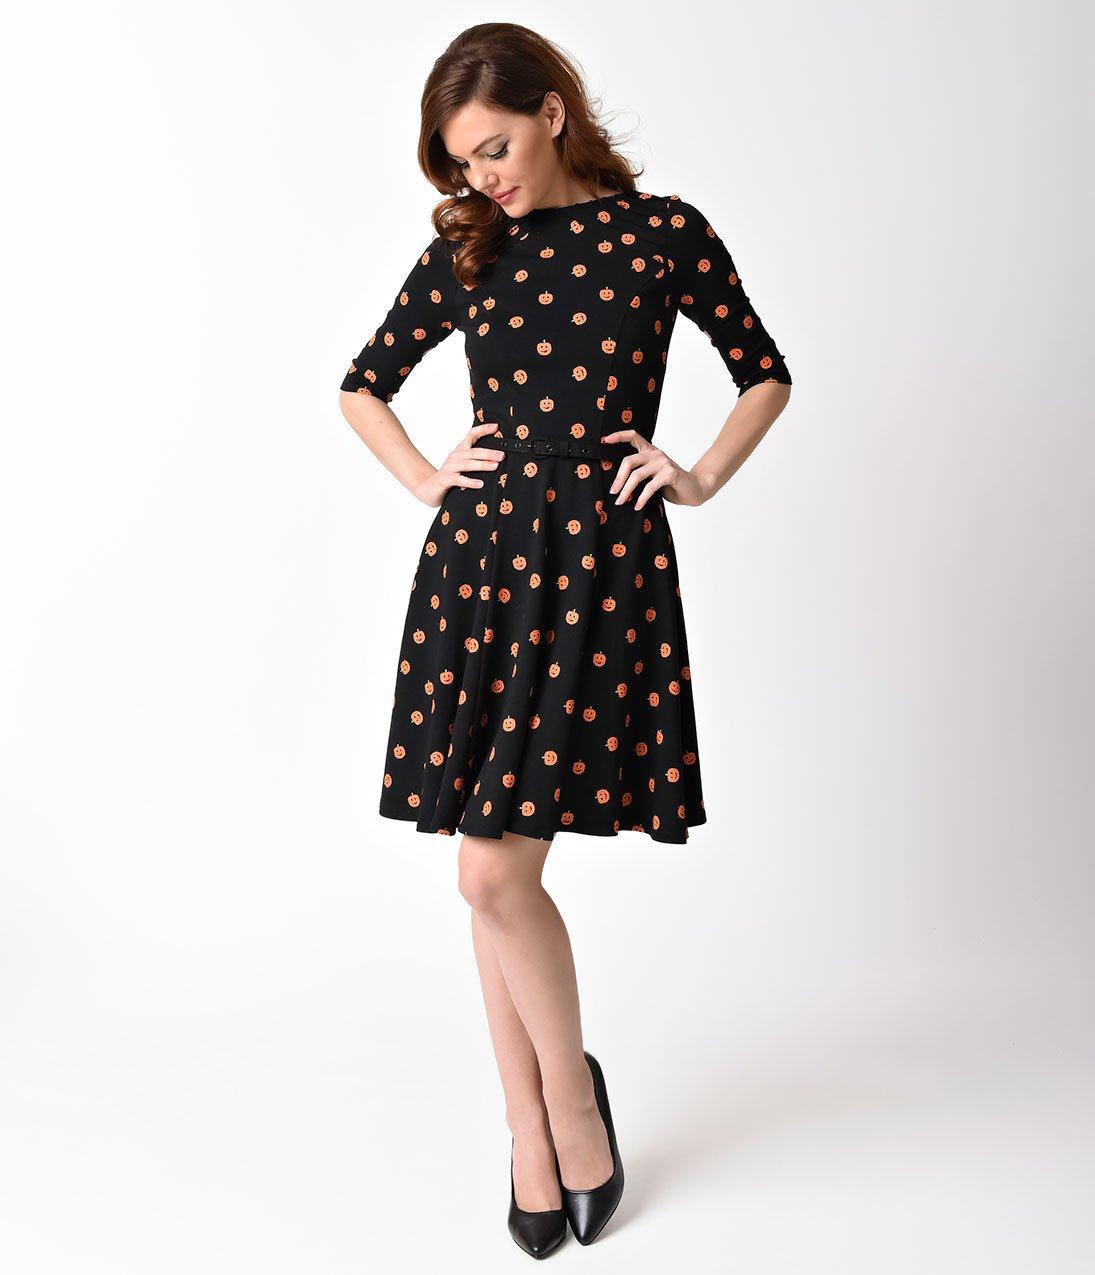 HepKat Clothing & Beauty Parlor